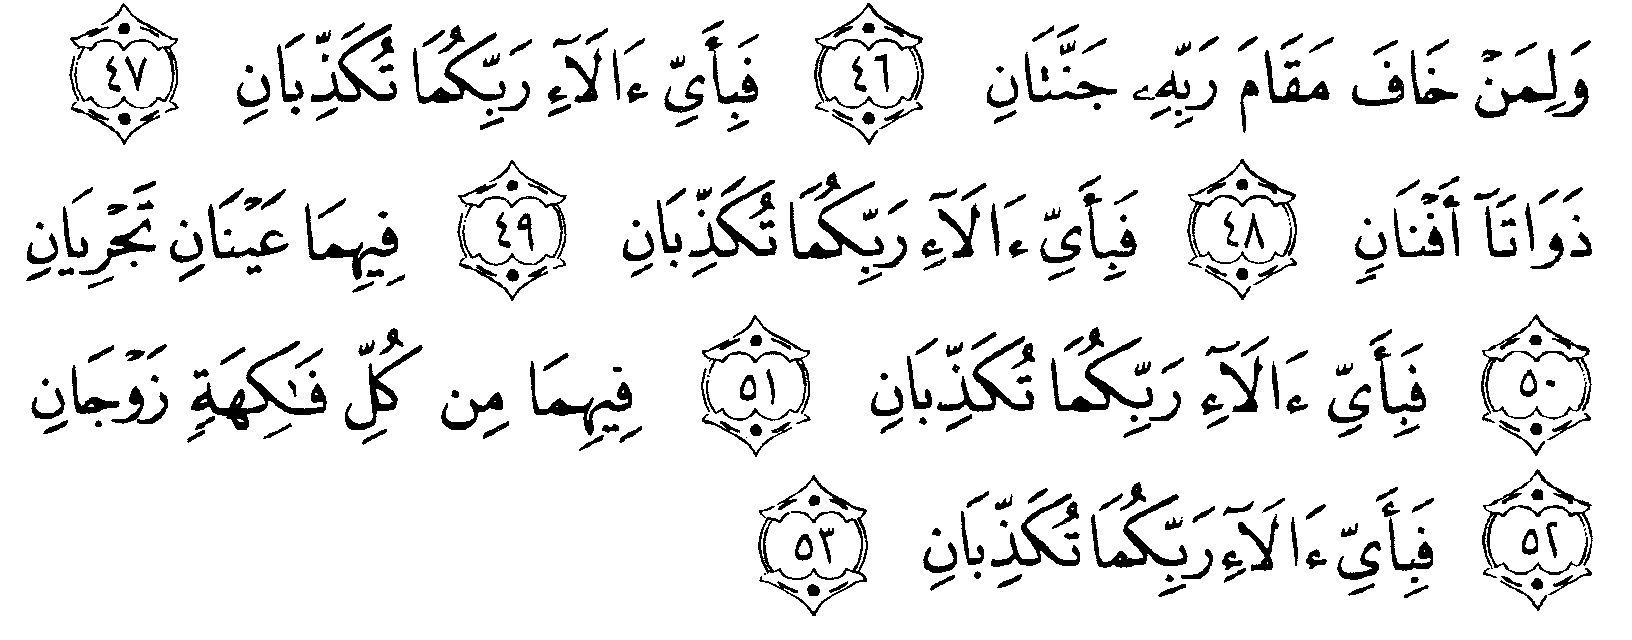 Tafsir Al Quran Surah Ar Rahman 5 Alquranmulia